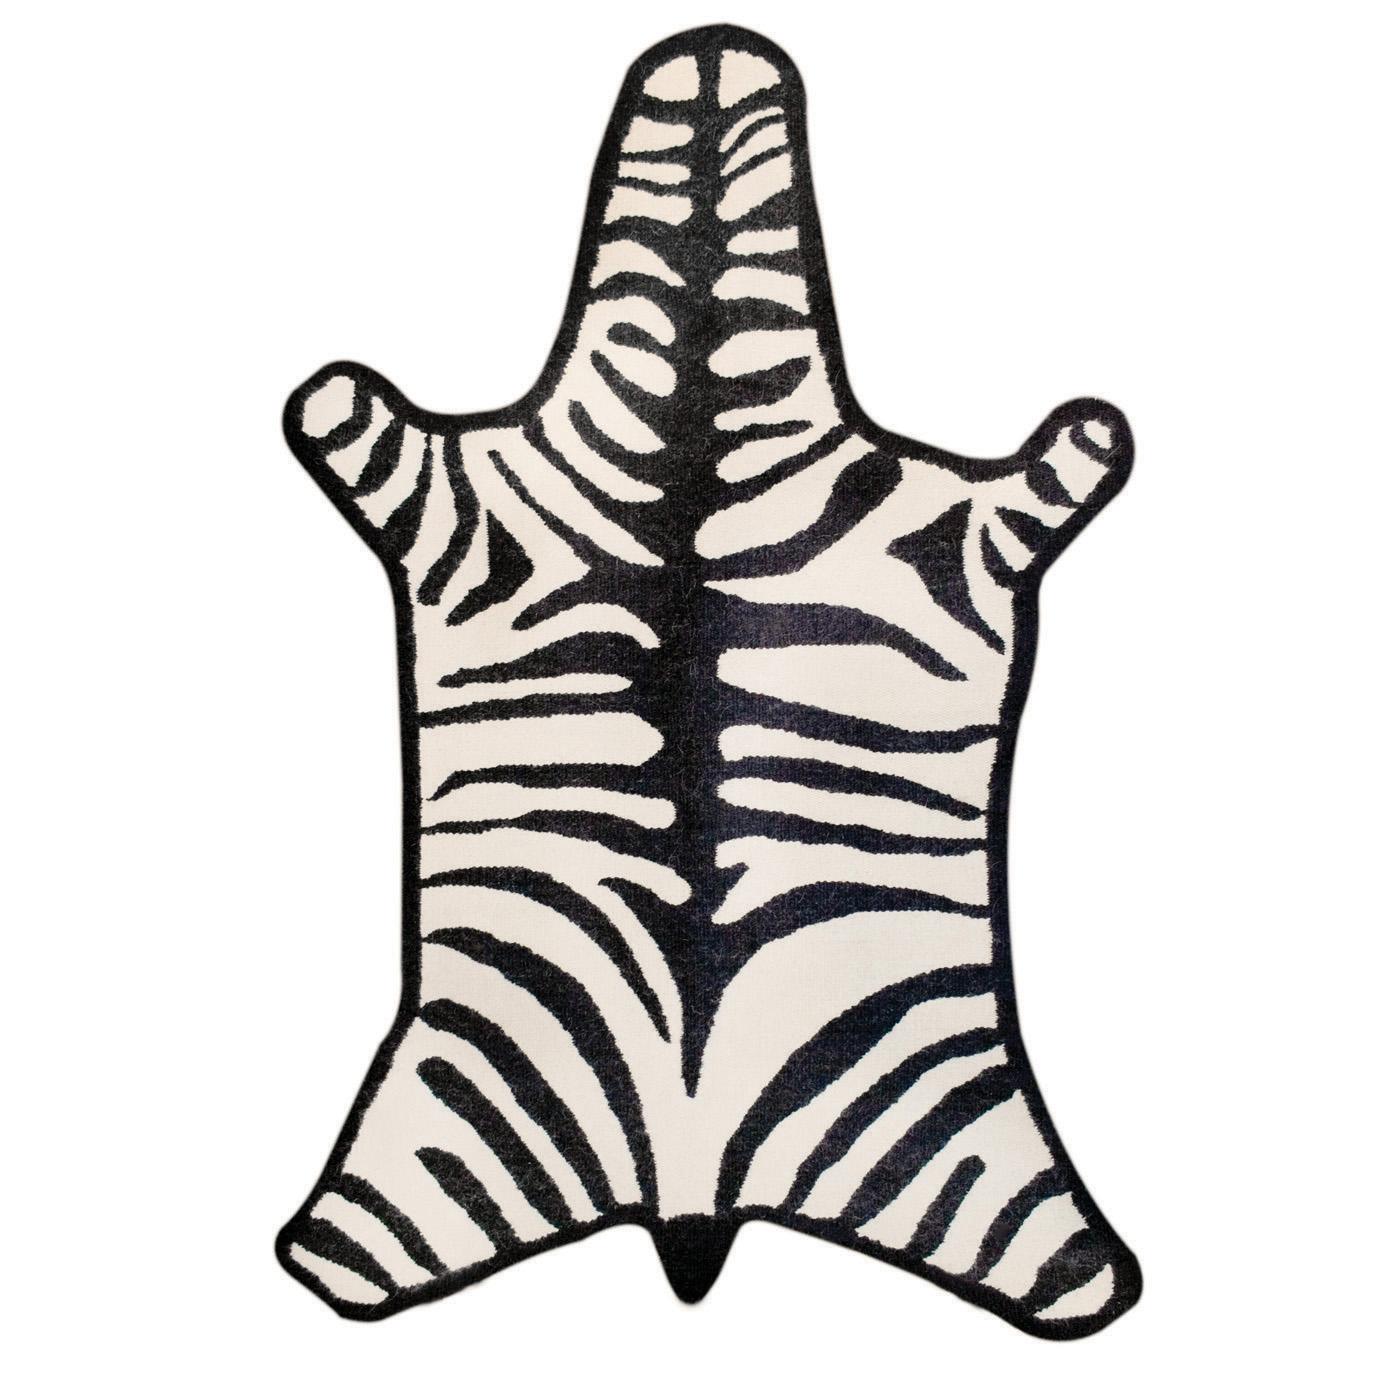 Zebra Sculpture Area Rug: Jonathan Adler Zebra Rug